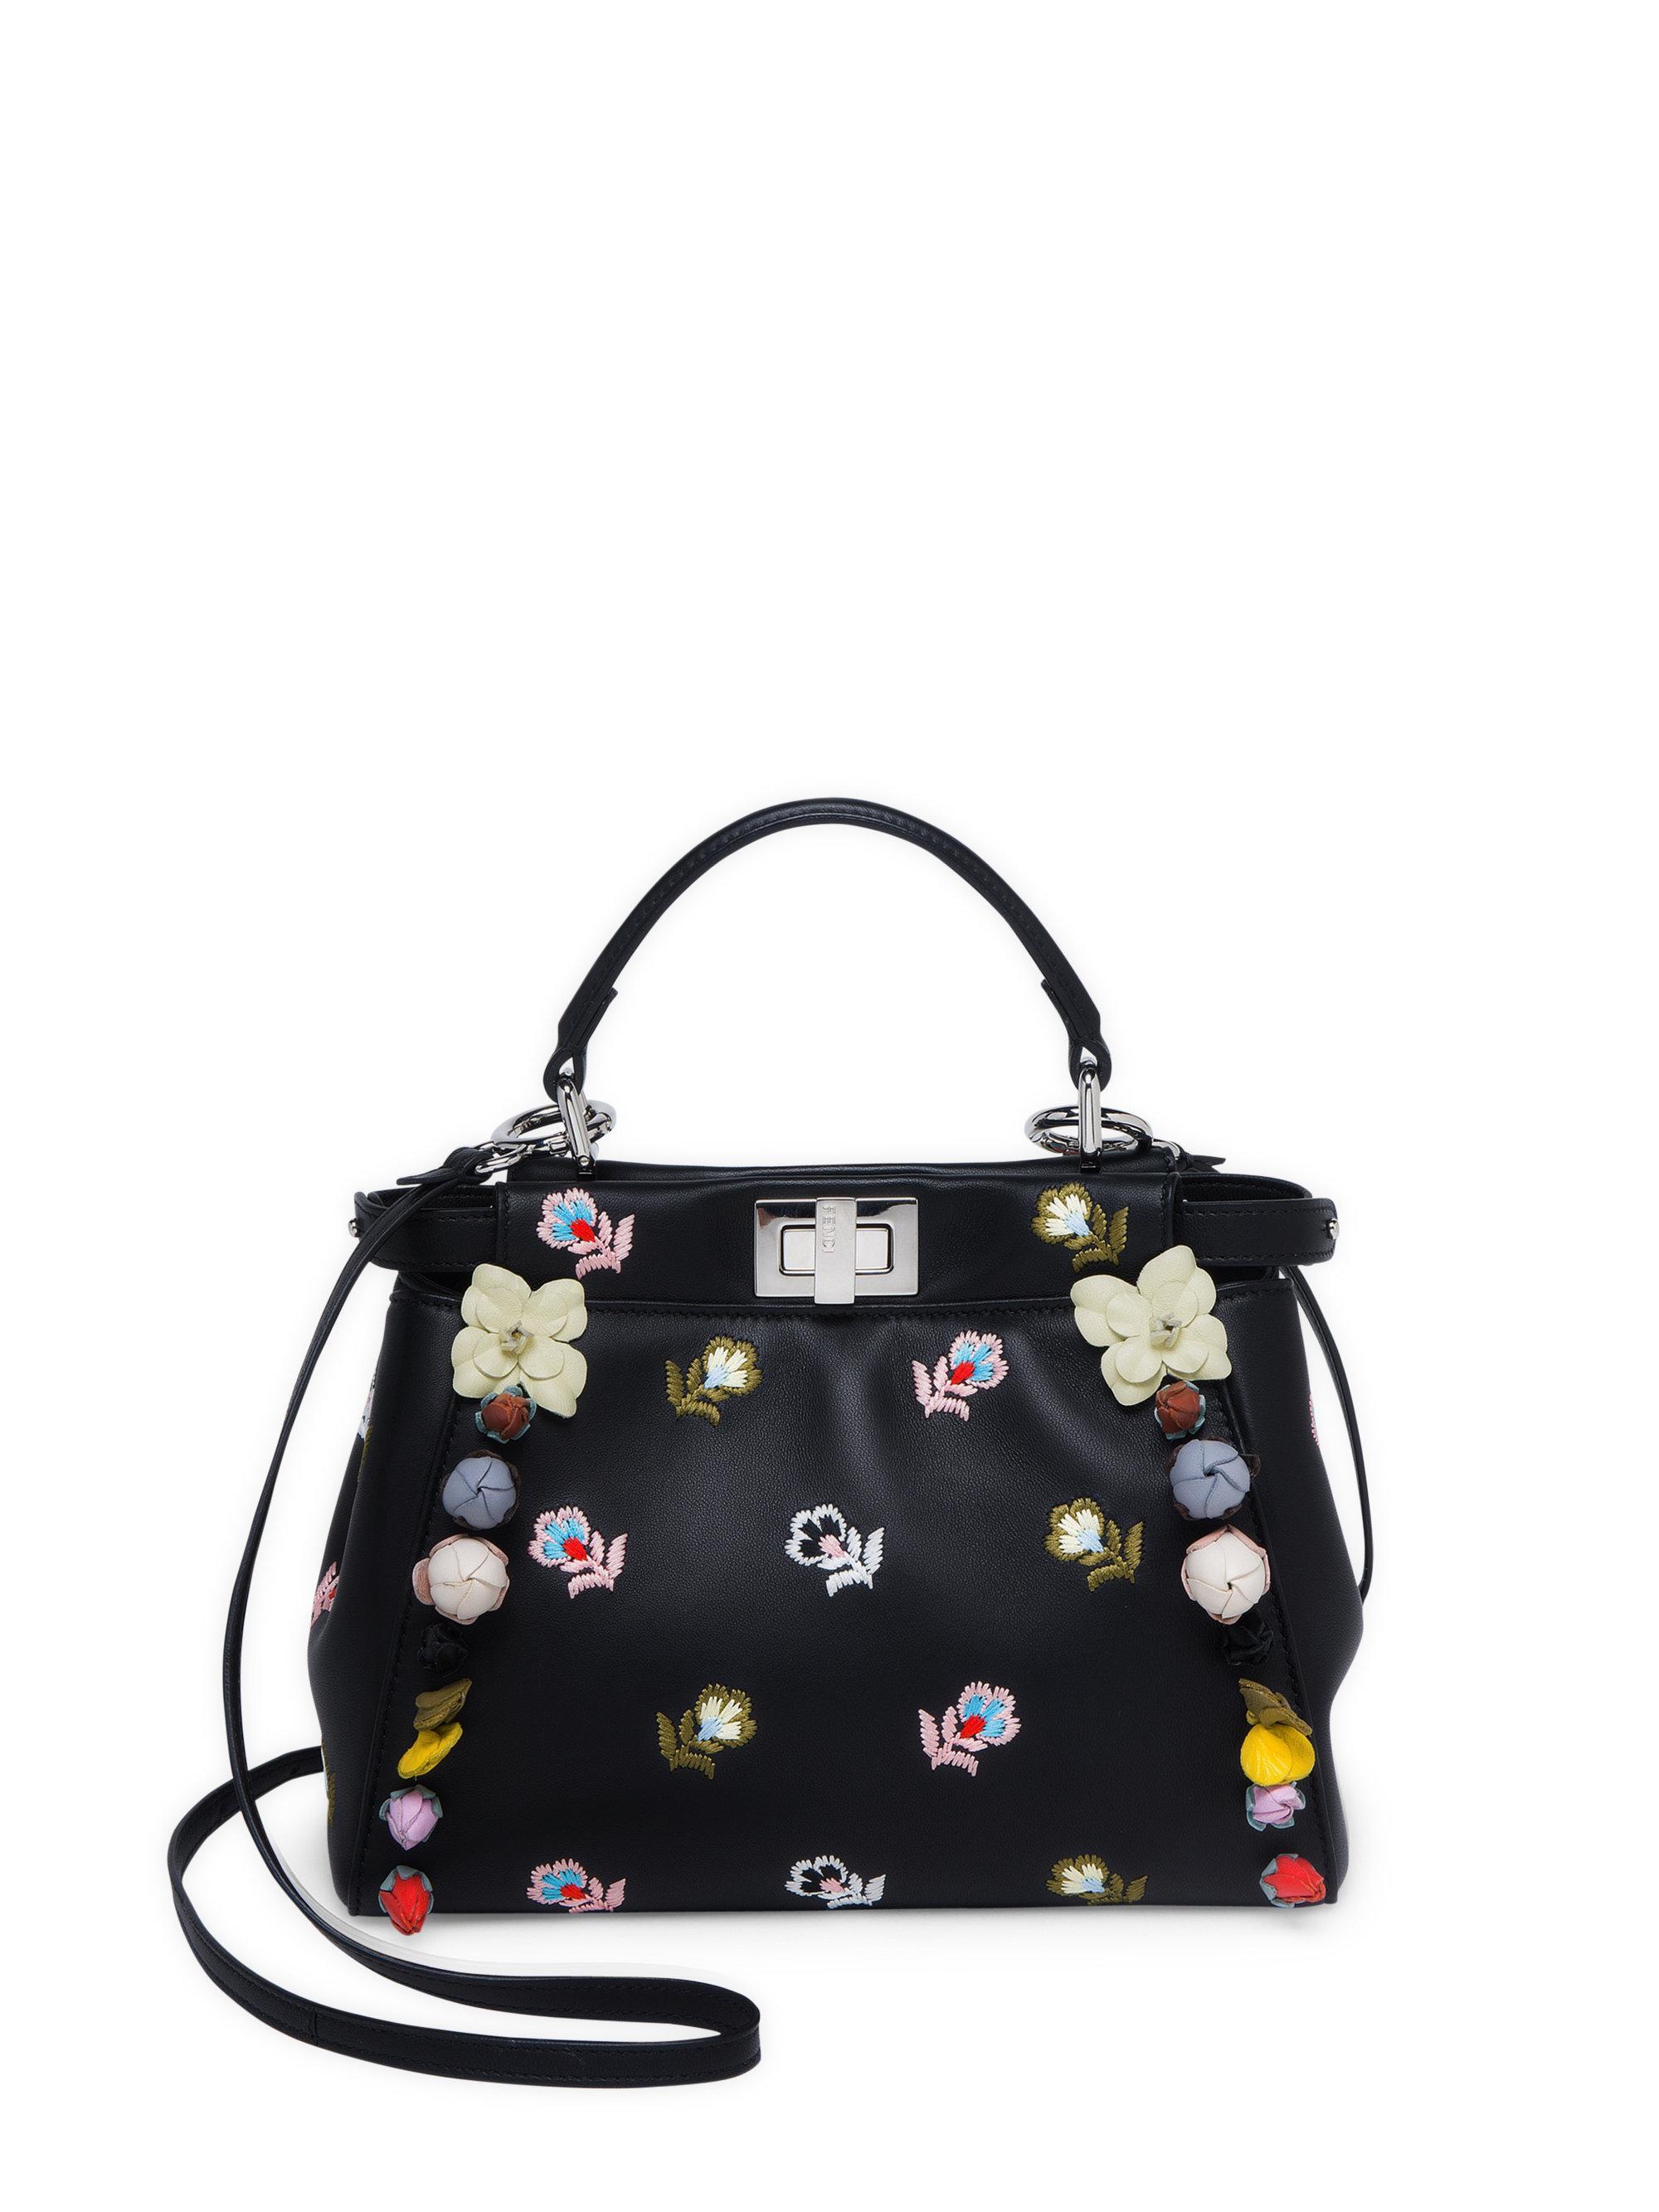 9e36861a6446 Fendi Peekaboo Mini Embellished Floral-embroidered Leather Satchel ...